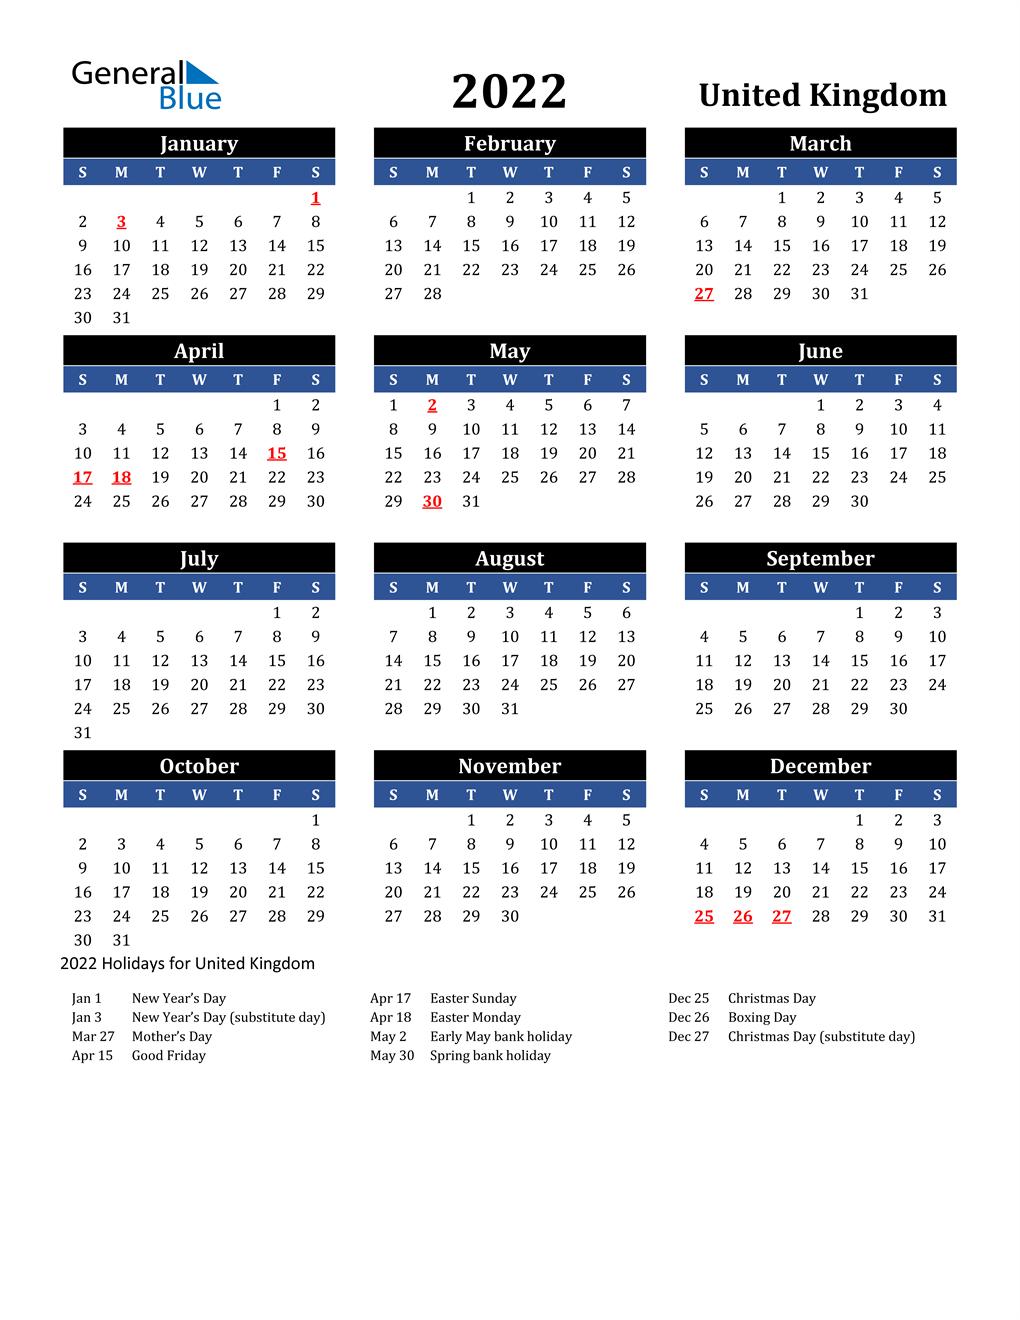 Timeanddate 2022 Calendar.2022 United Kingdom Calendar With Holidays